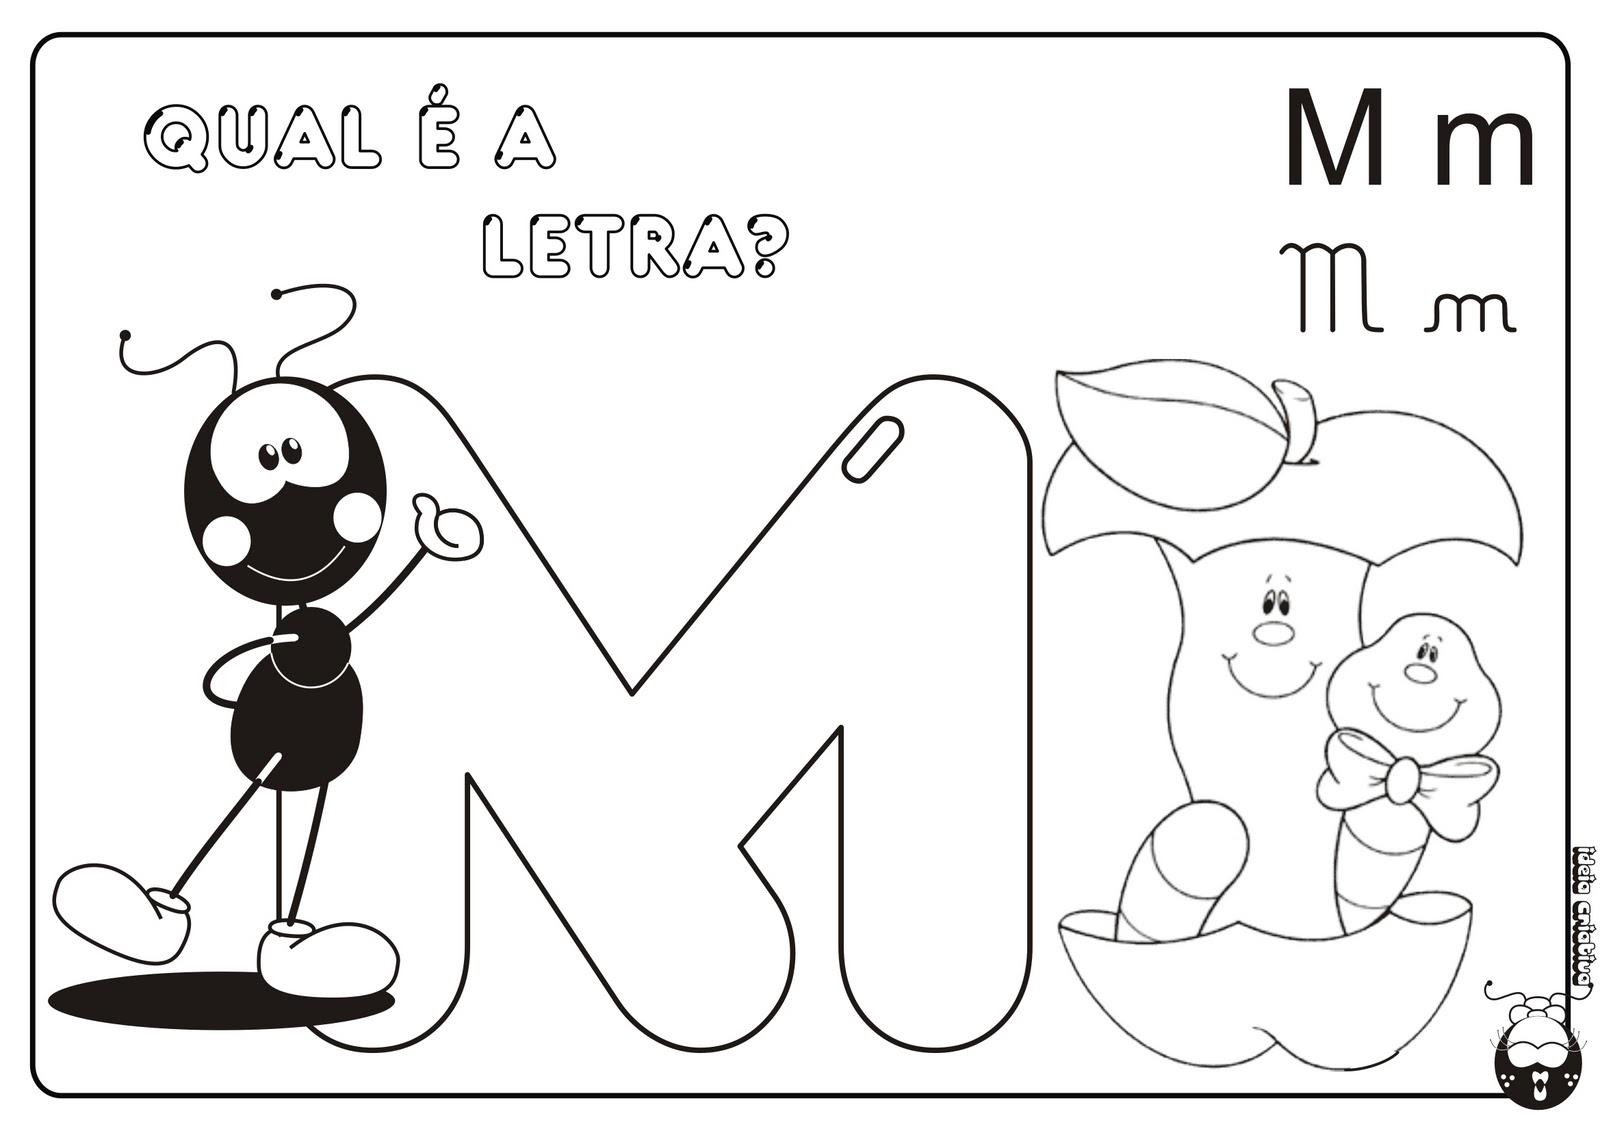 Alfabeto Smilinguido 4 tipos de letra para Baixar Grátis Letra M